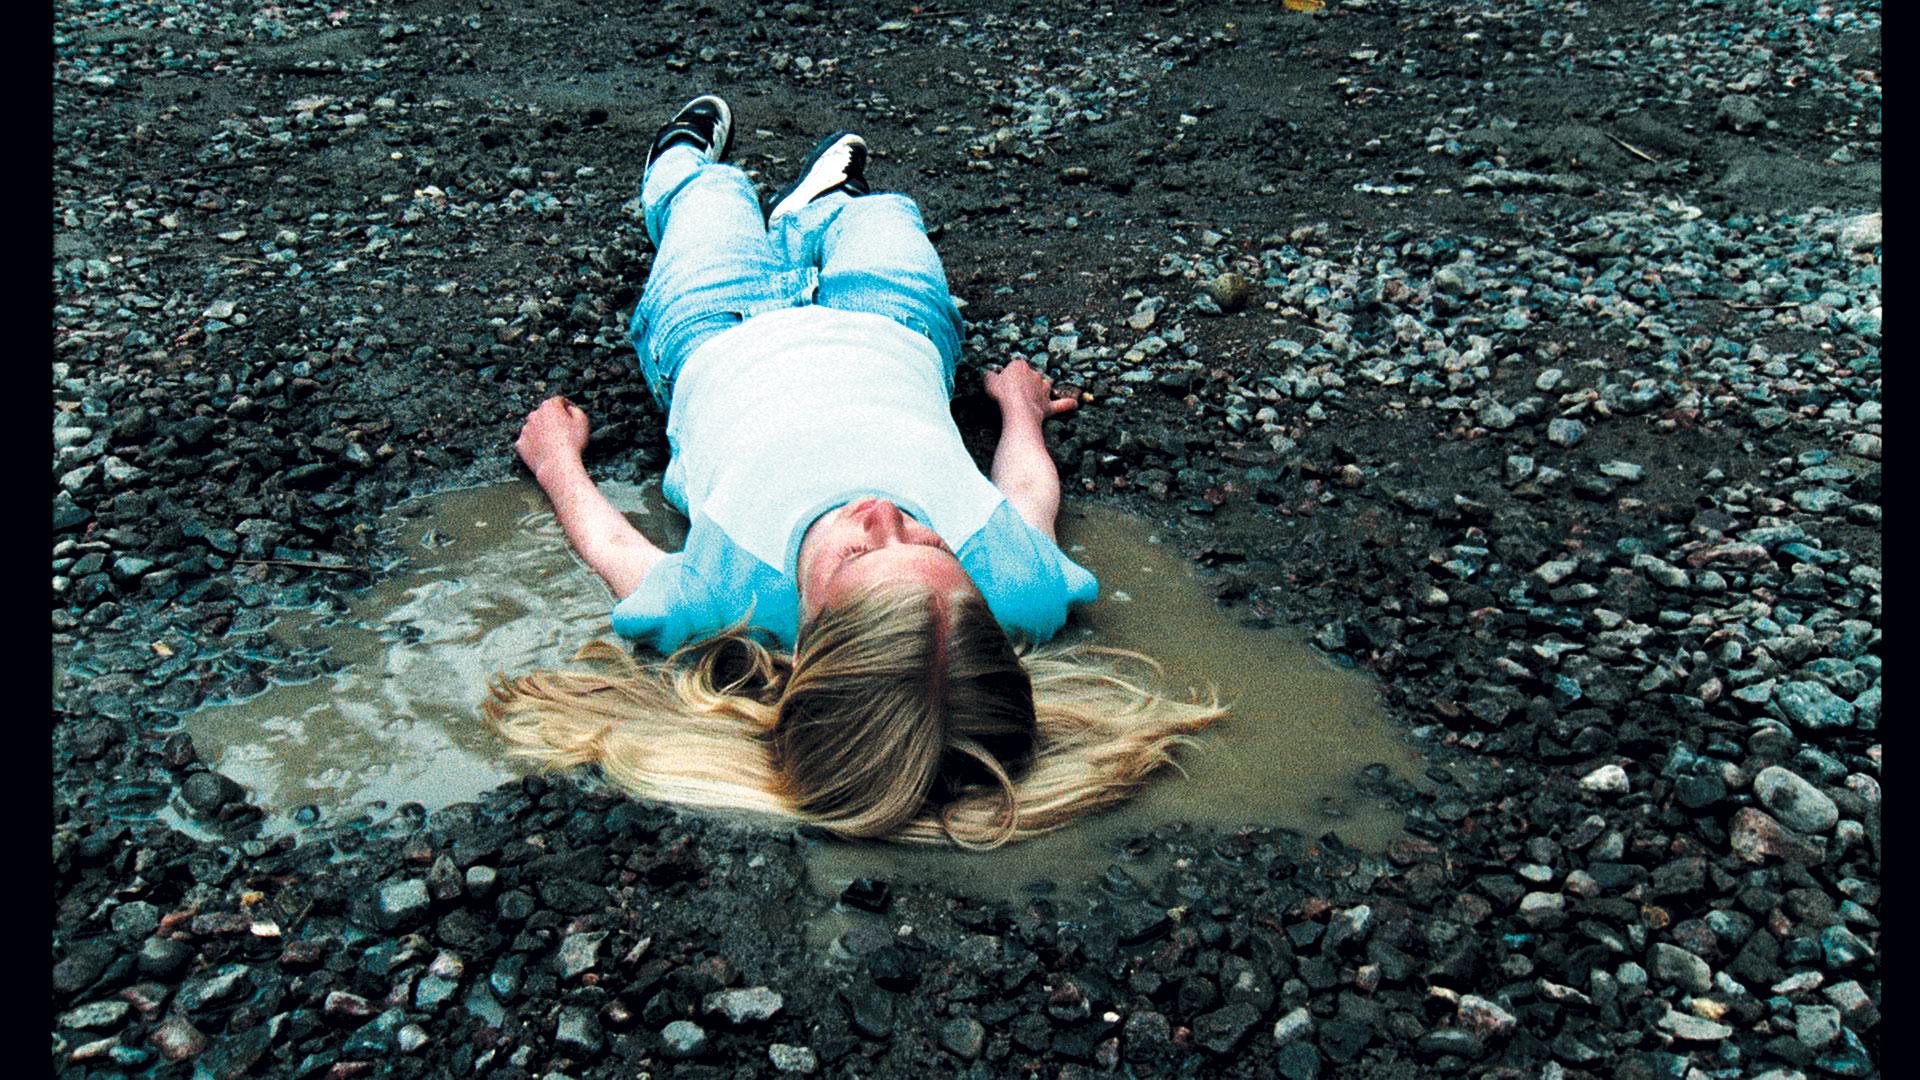 "EIJA-LIISA AHTILA. ""LAHJA/THE PRESENT"" (2001). VIDEO STILL. 5 SHORT FILMS AS A DVD INSTALLATION, STEREO SURROUND SOUND. COURTESY OF THE ARTIST AND MARIAN GOODMAN GALLERY, NEW YORK AND PARIS. PHOTO: © 2007 CRYSTAL EYE – KRISTALLISILMÄ OY."